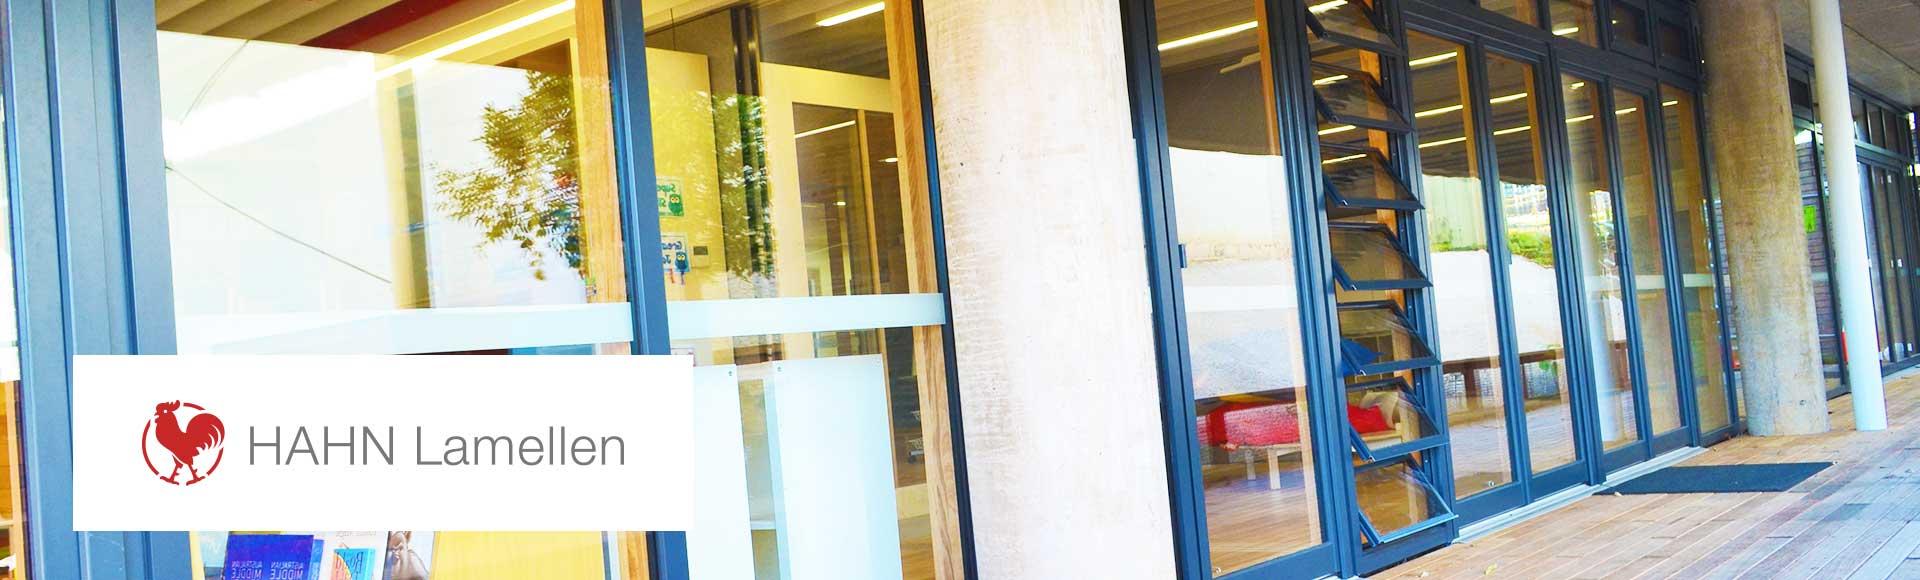 beautiful facade featuring HAHN louvre windows with deep blue aluminium frame